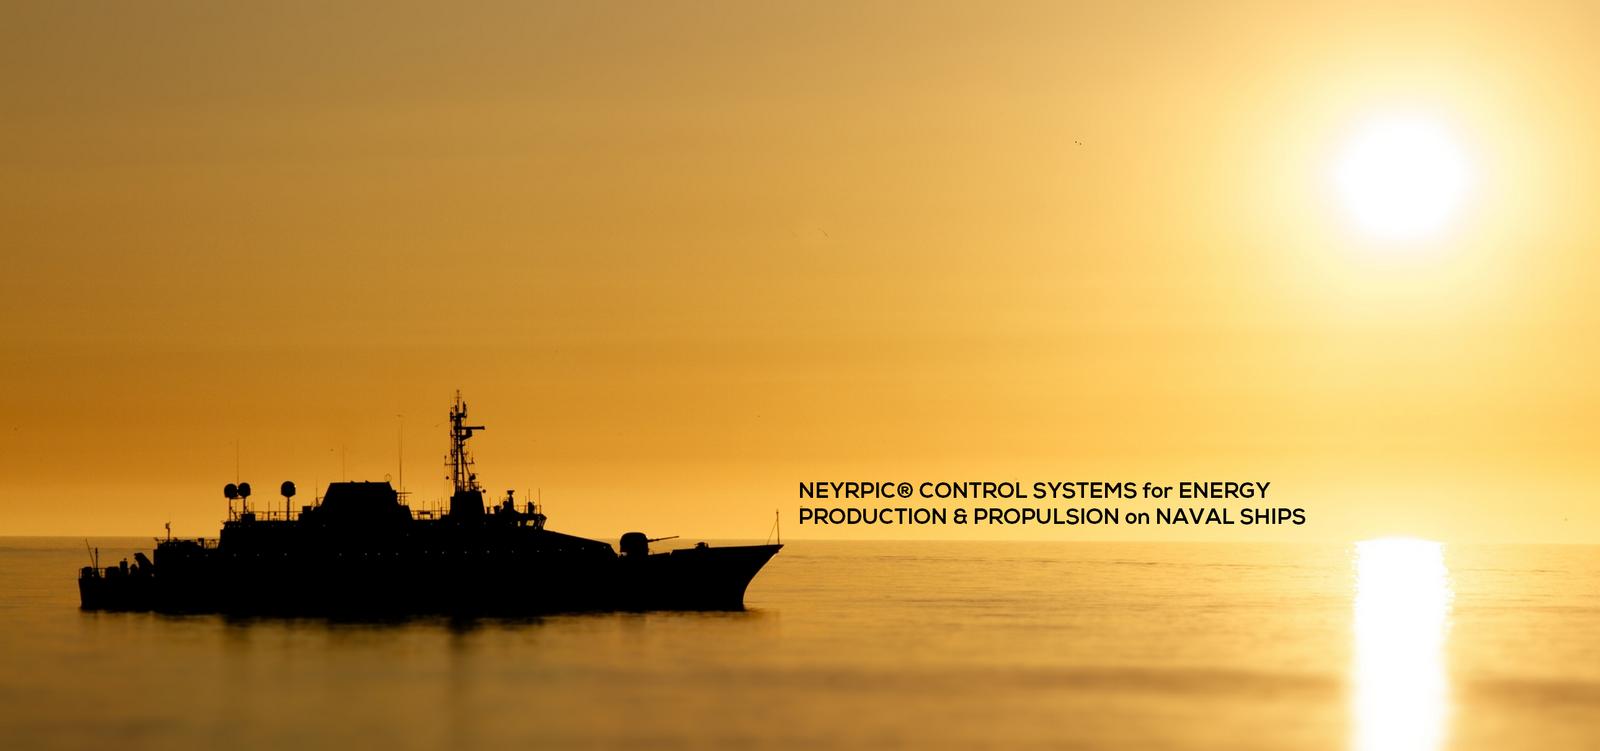 Naval-avec-texte-3